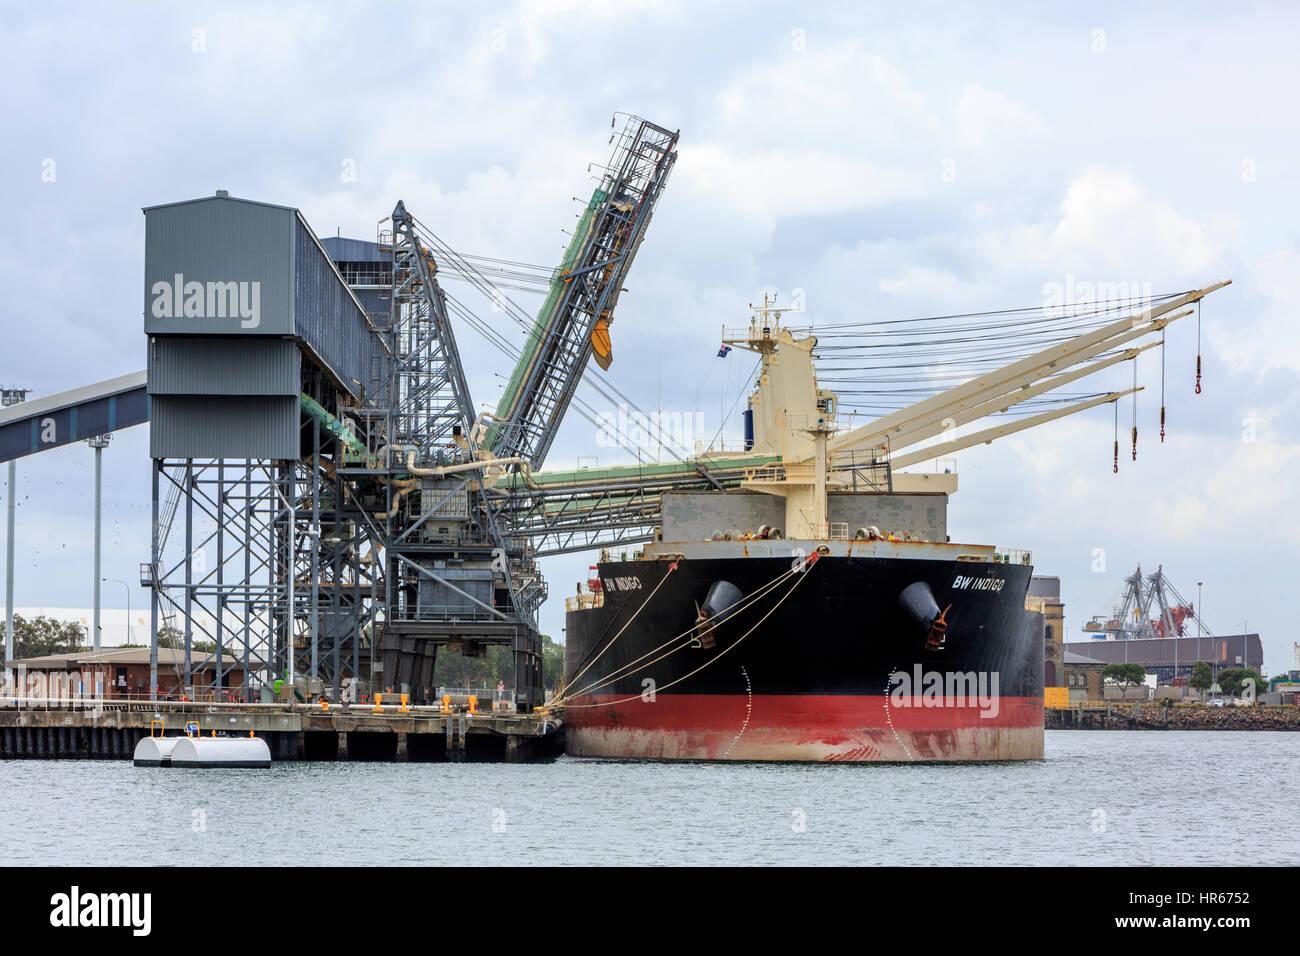 BW Indigo bulk carrier vessel in Newcastle port, new south wales,australia - Stock Image